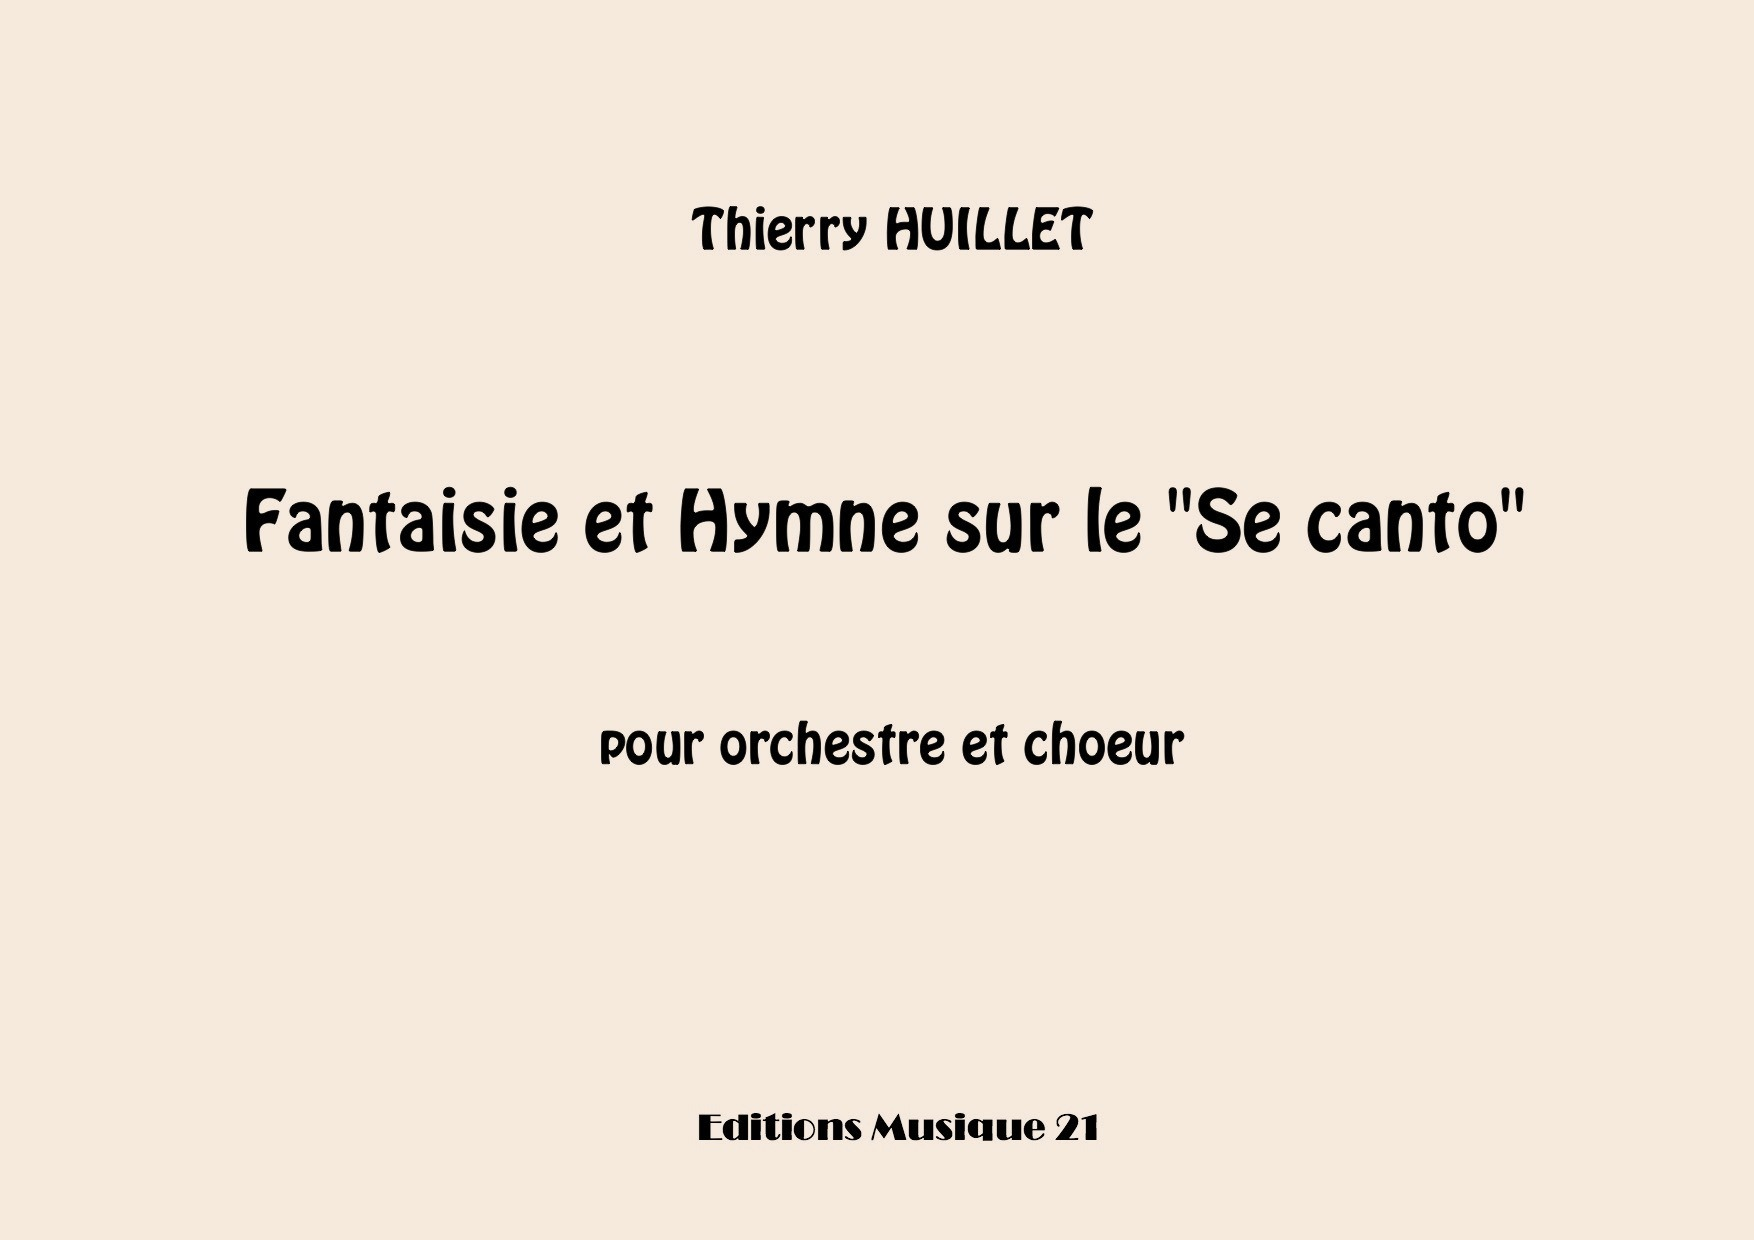 Huillet: Fantaisie Et Hymne Sur Le Se Canto, For Orchestra And Choir